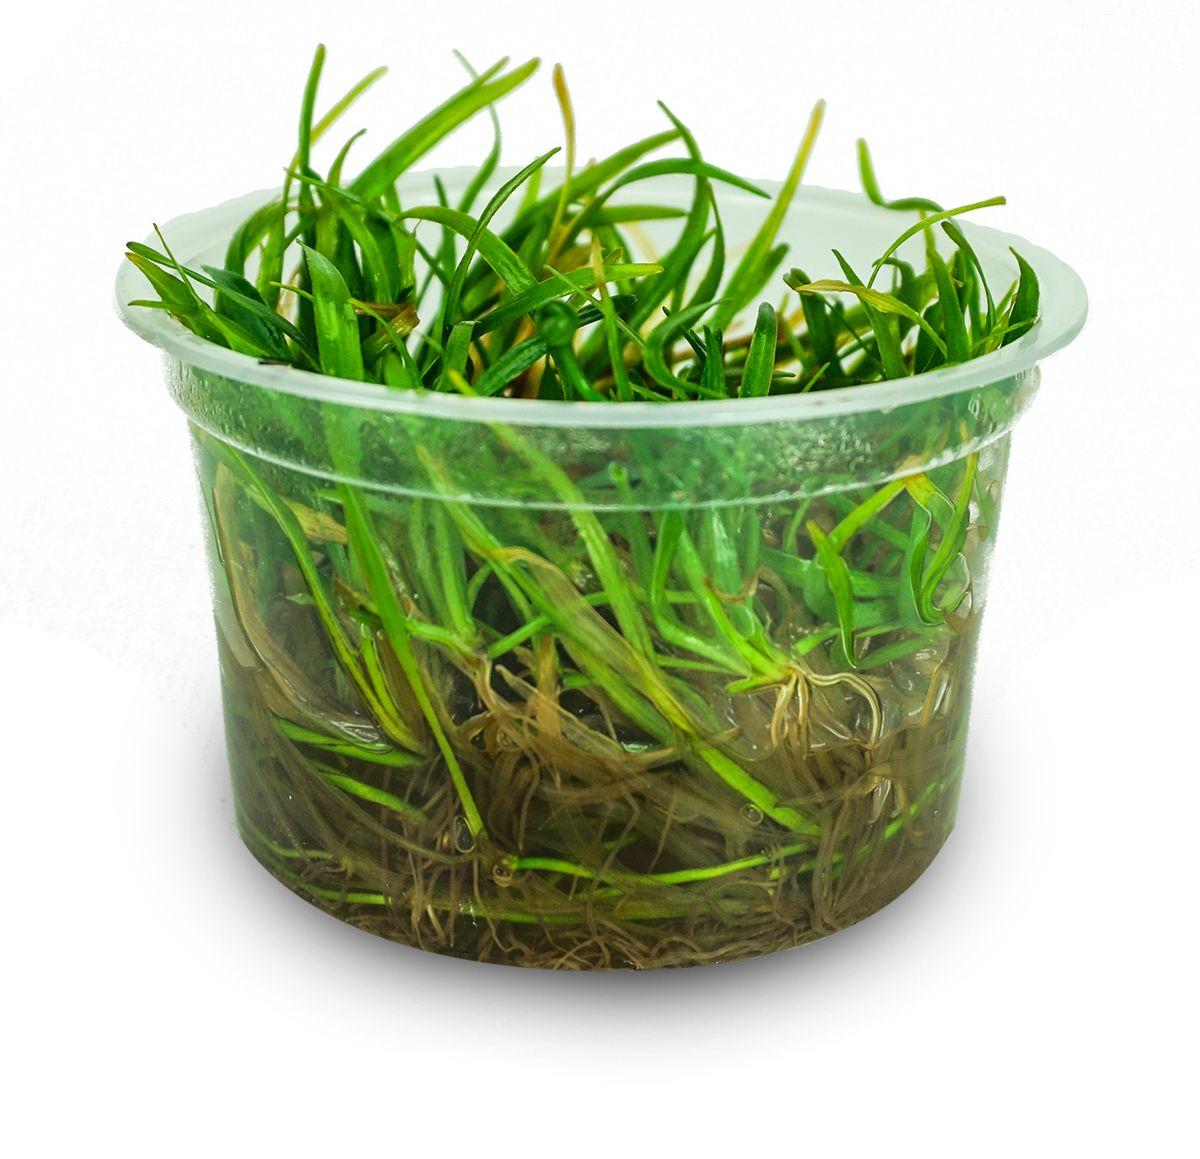 Helanthium Tenellum Green Pygmy Chain Sword Aquatic Plants Josh S Frogs Mini Plants Plants Terrarium Plants For Sale